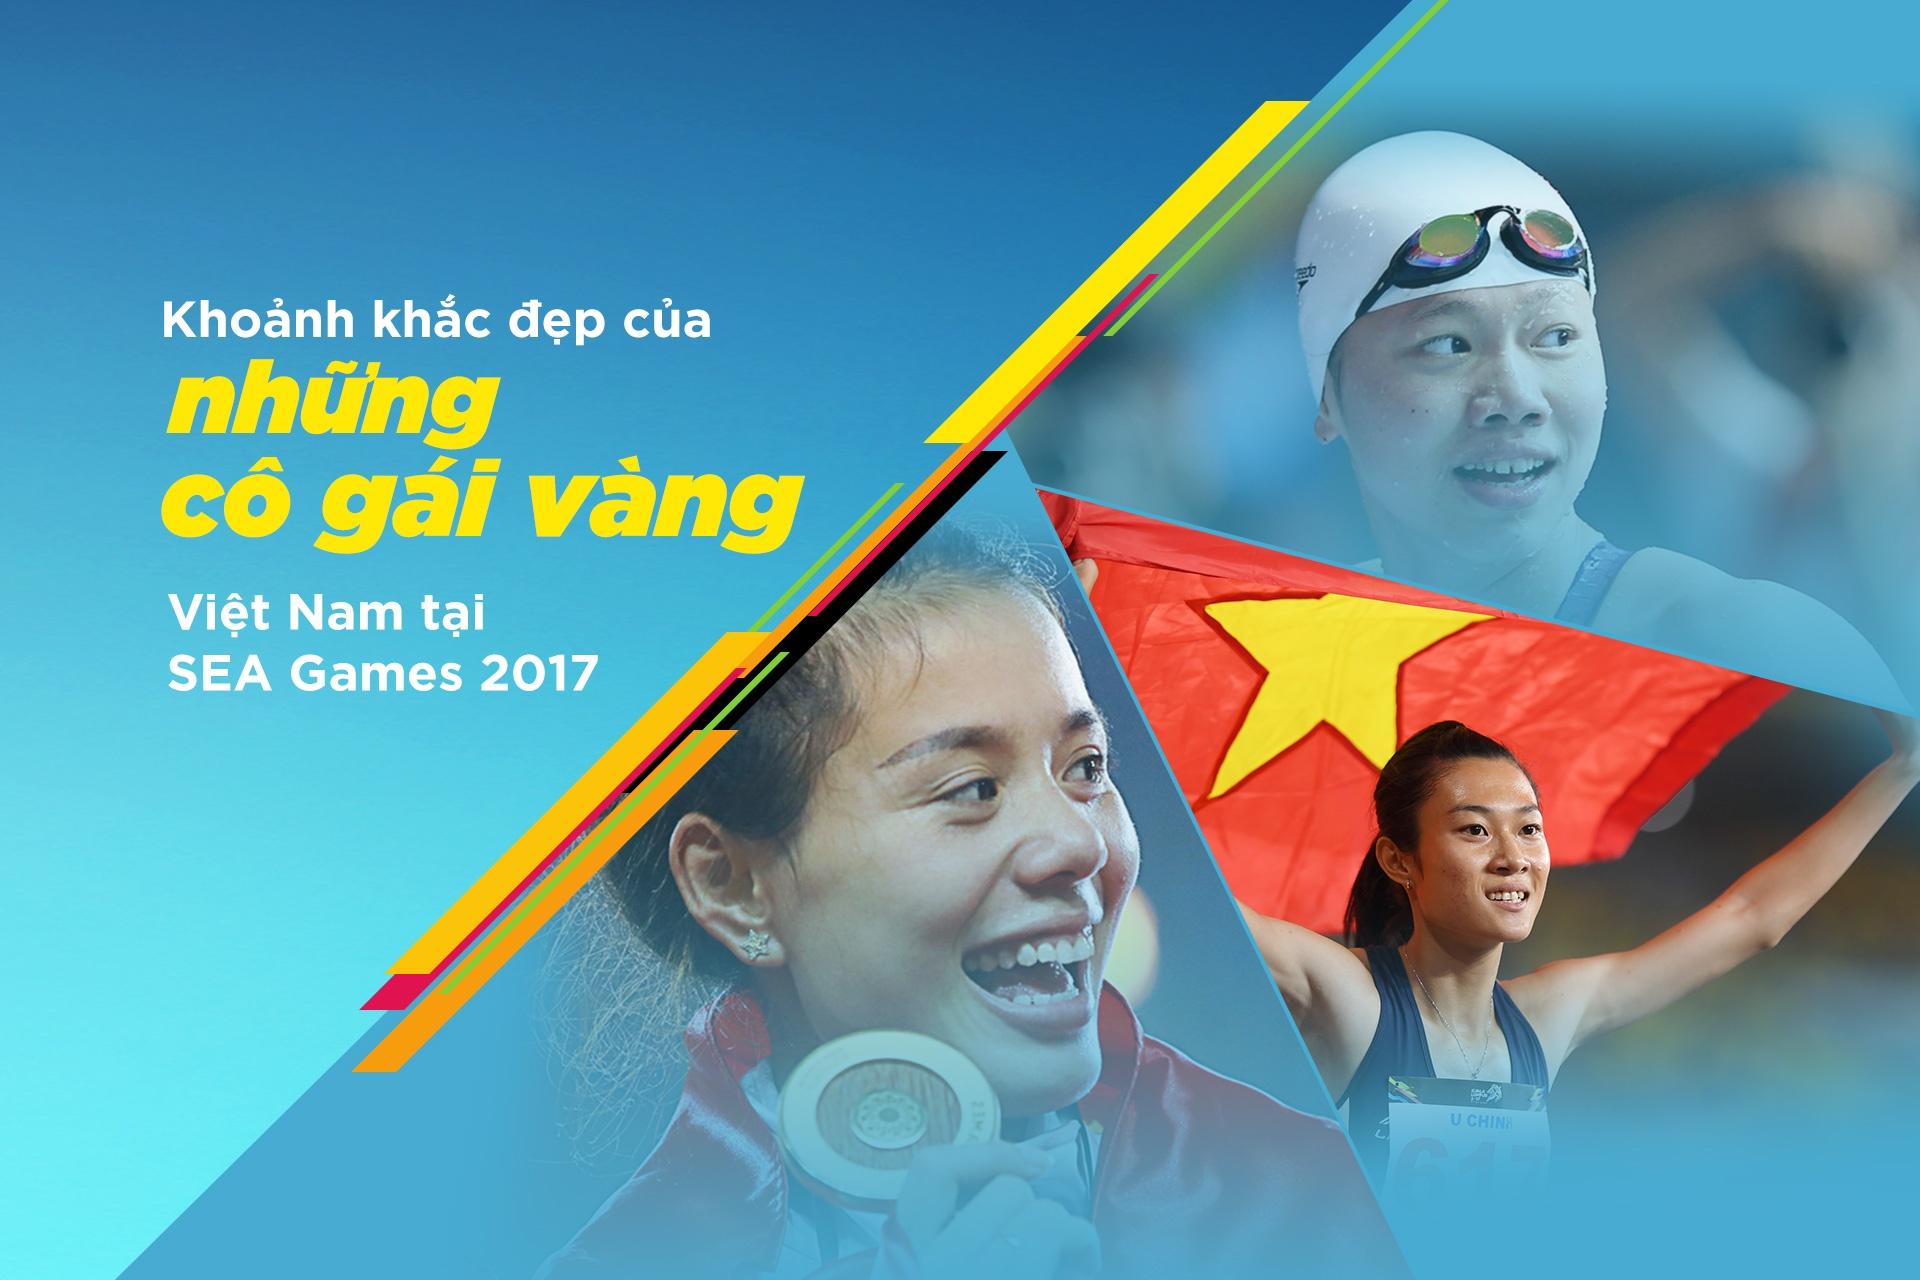 Khoanh khac dep cua nhung co gai vang Viet Nam tai SEA Games 2017 hinh anh 1